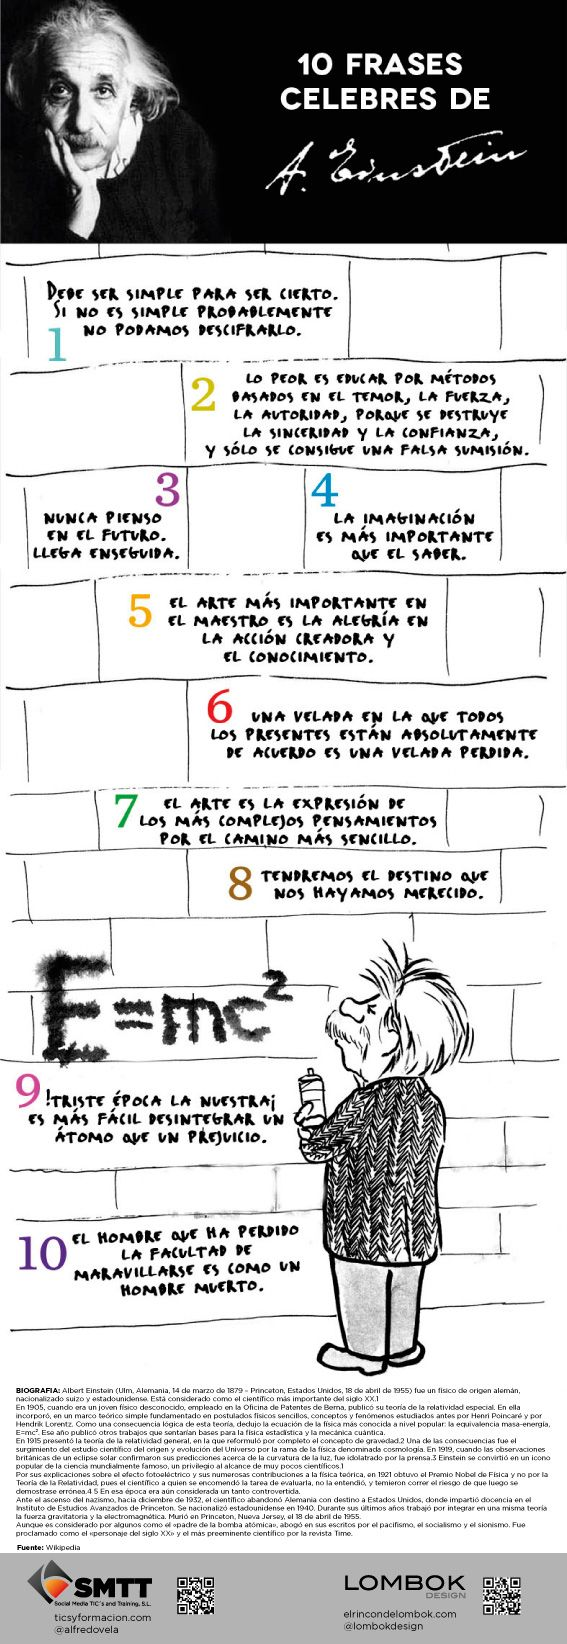 #Infografia de las 10 frases celebres de Einstein